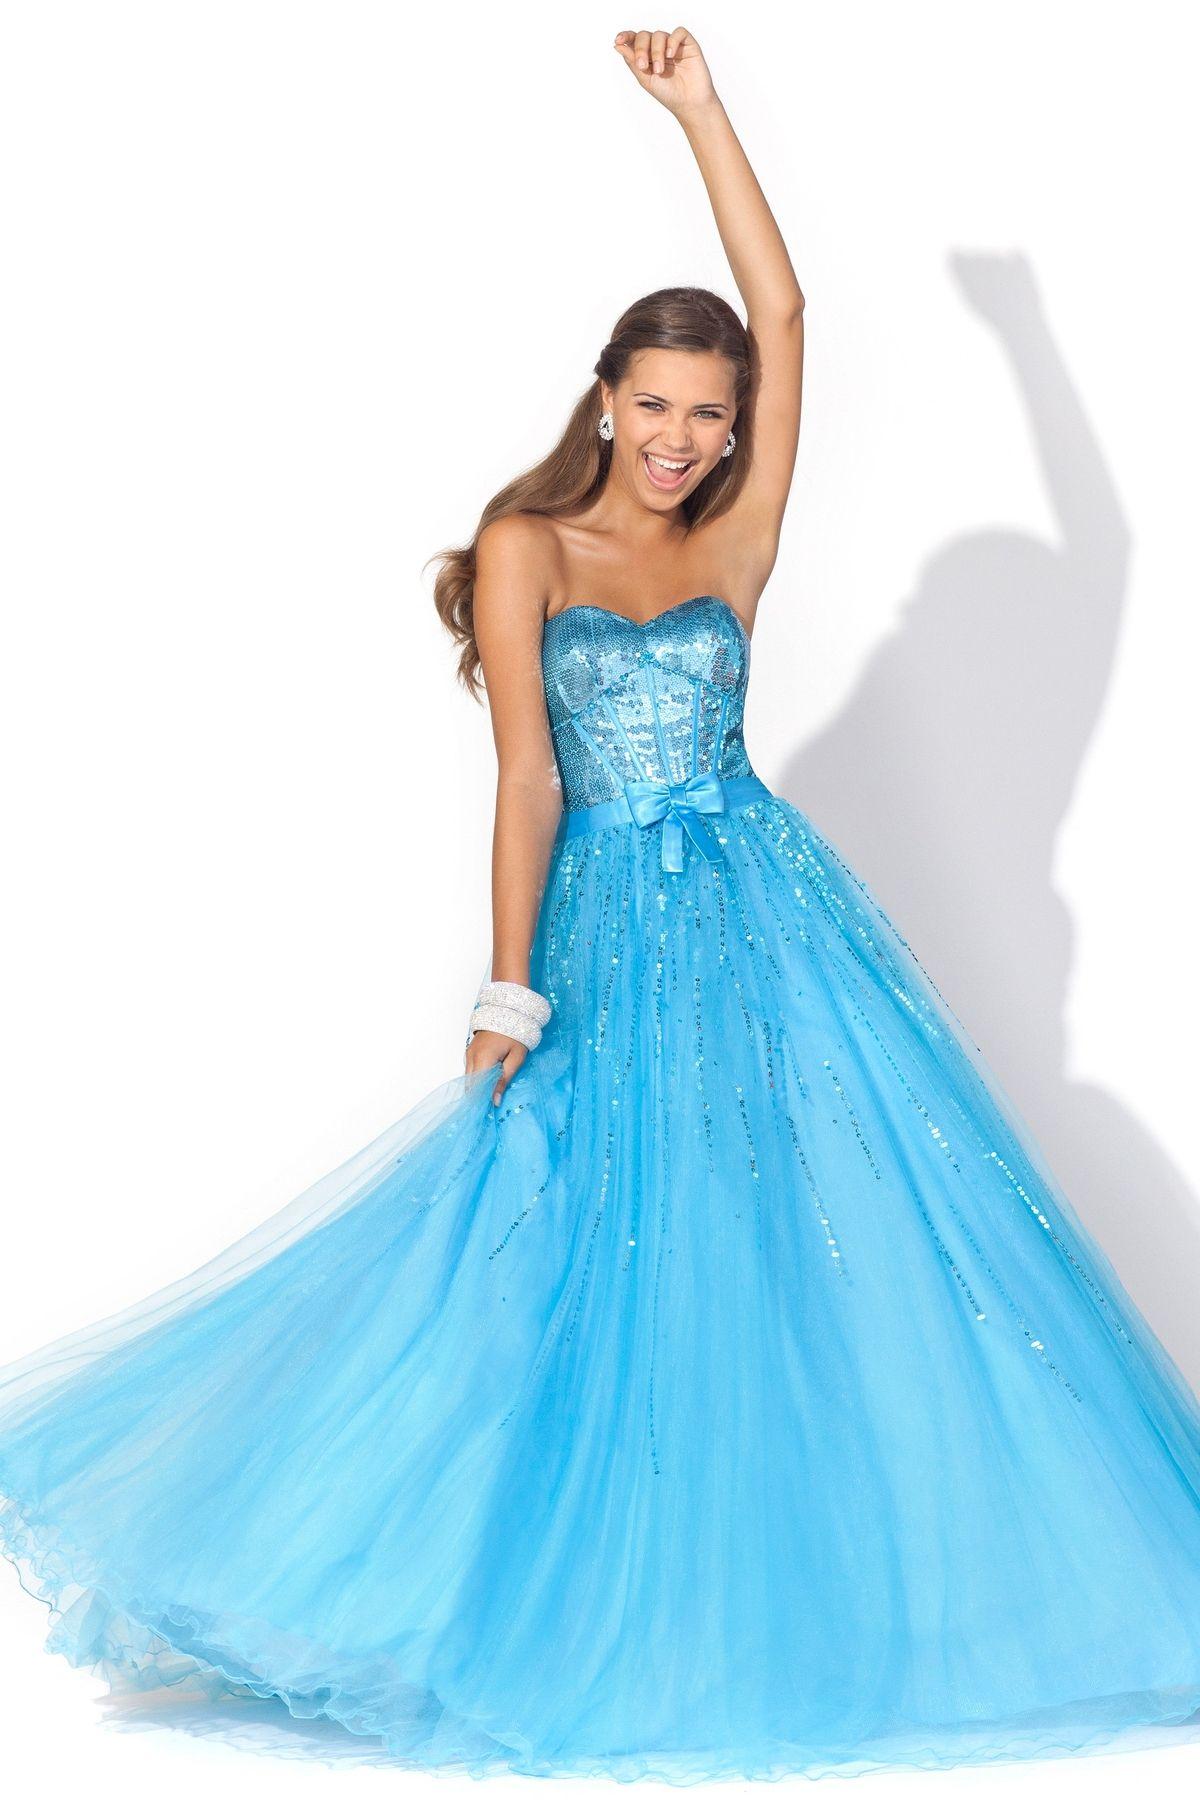 fancy ball gowns   Beautifull Gowns   Pinterest   Full skirts ...